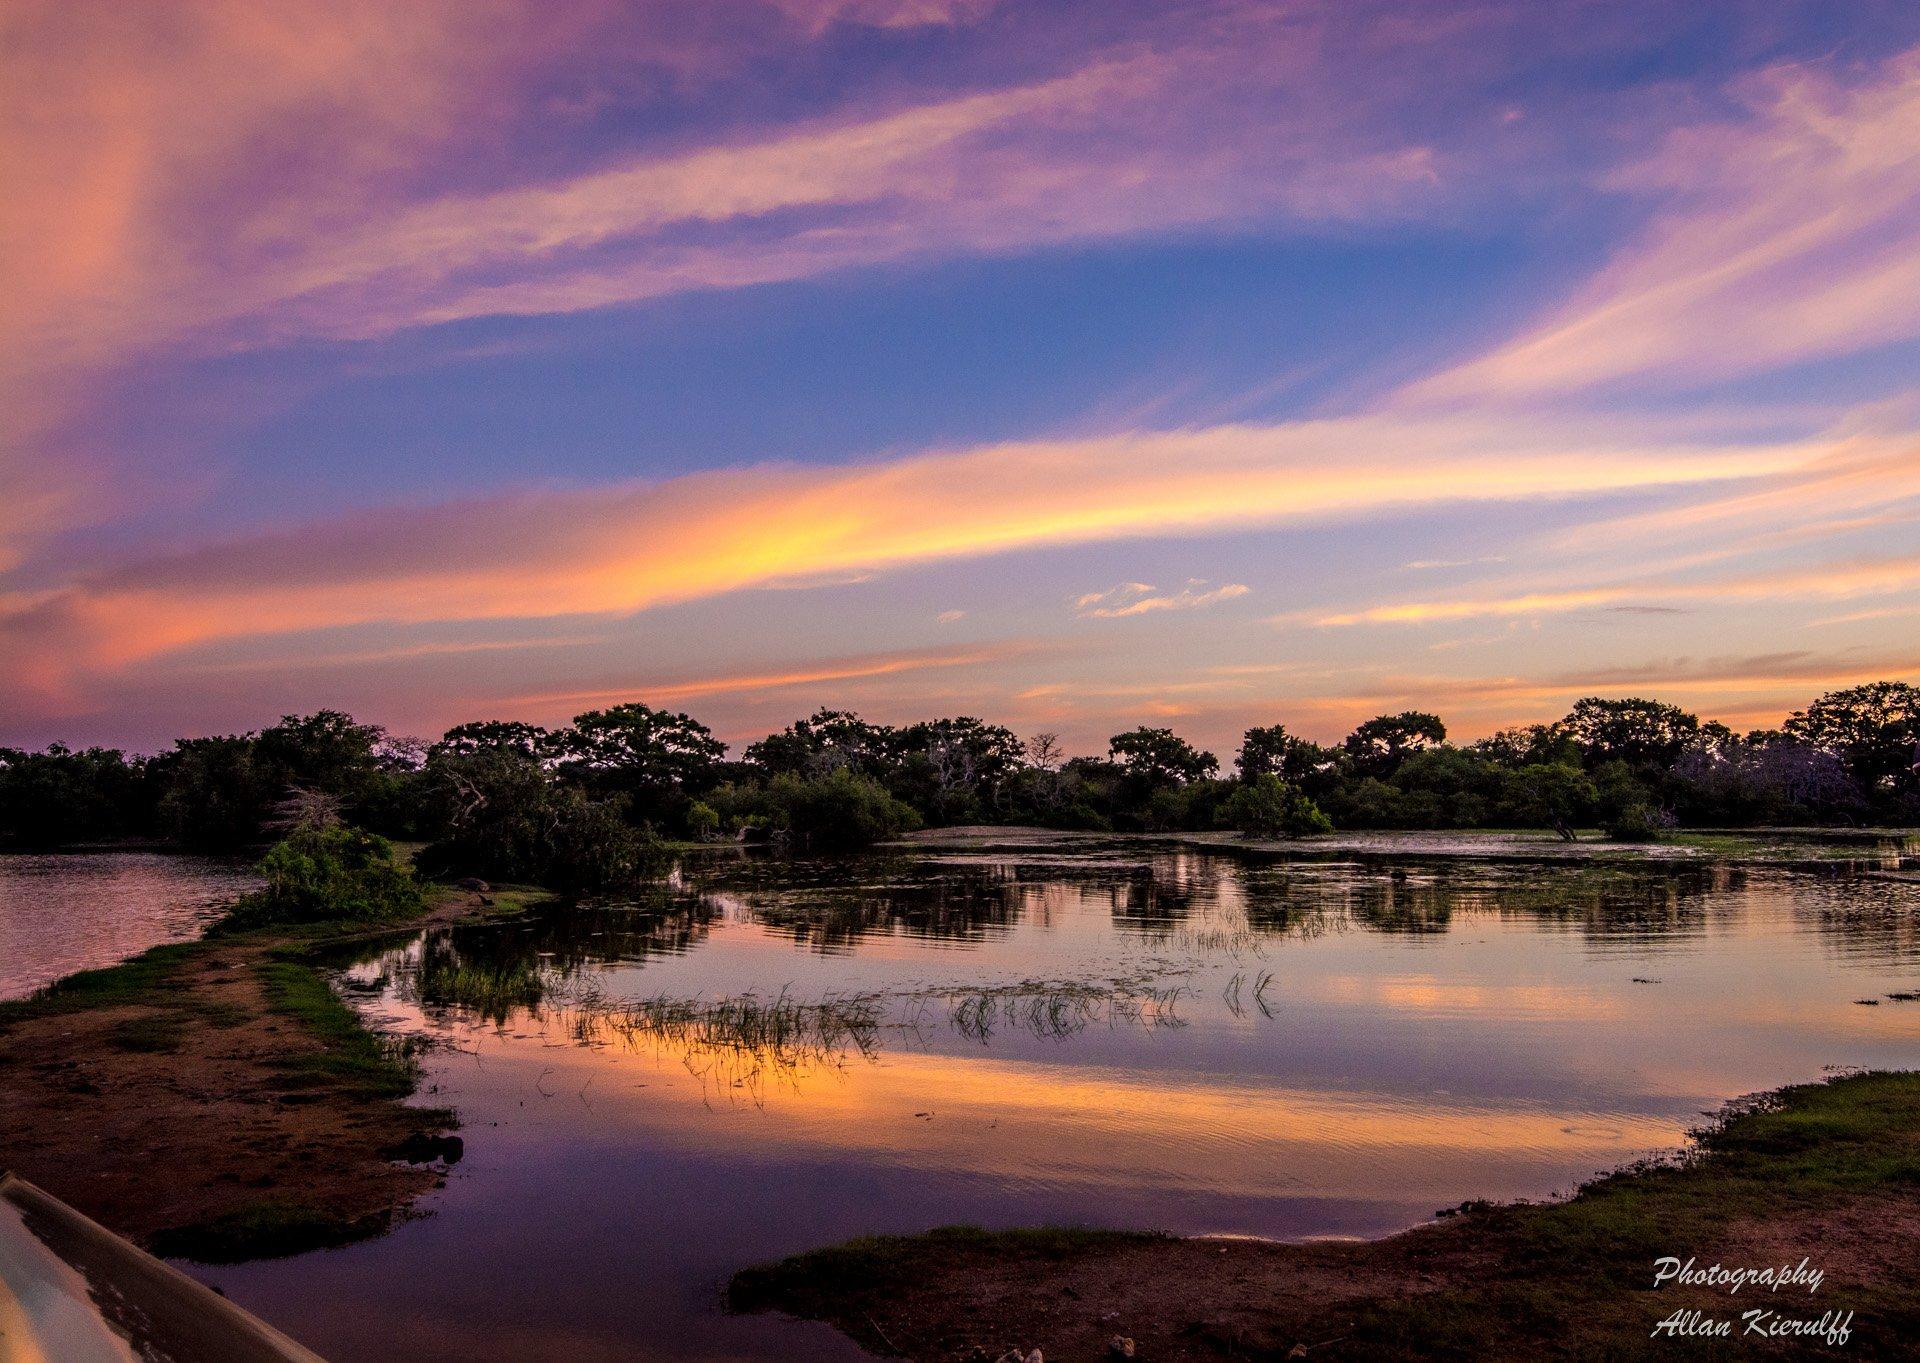 På tur til den fantastiske og eksotiske jungle-Ø Sri Lanka.